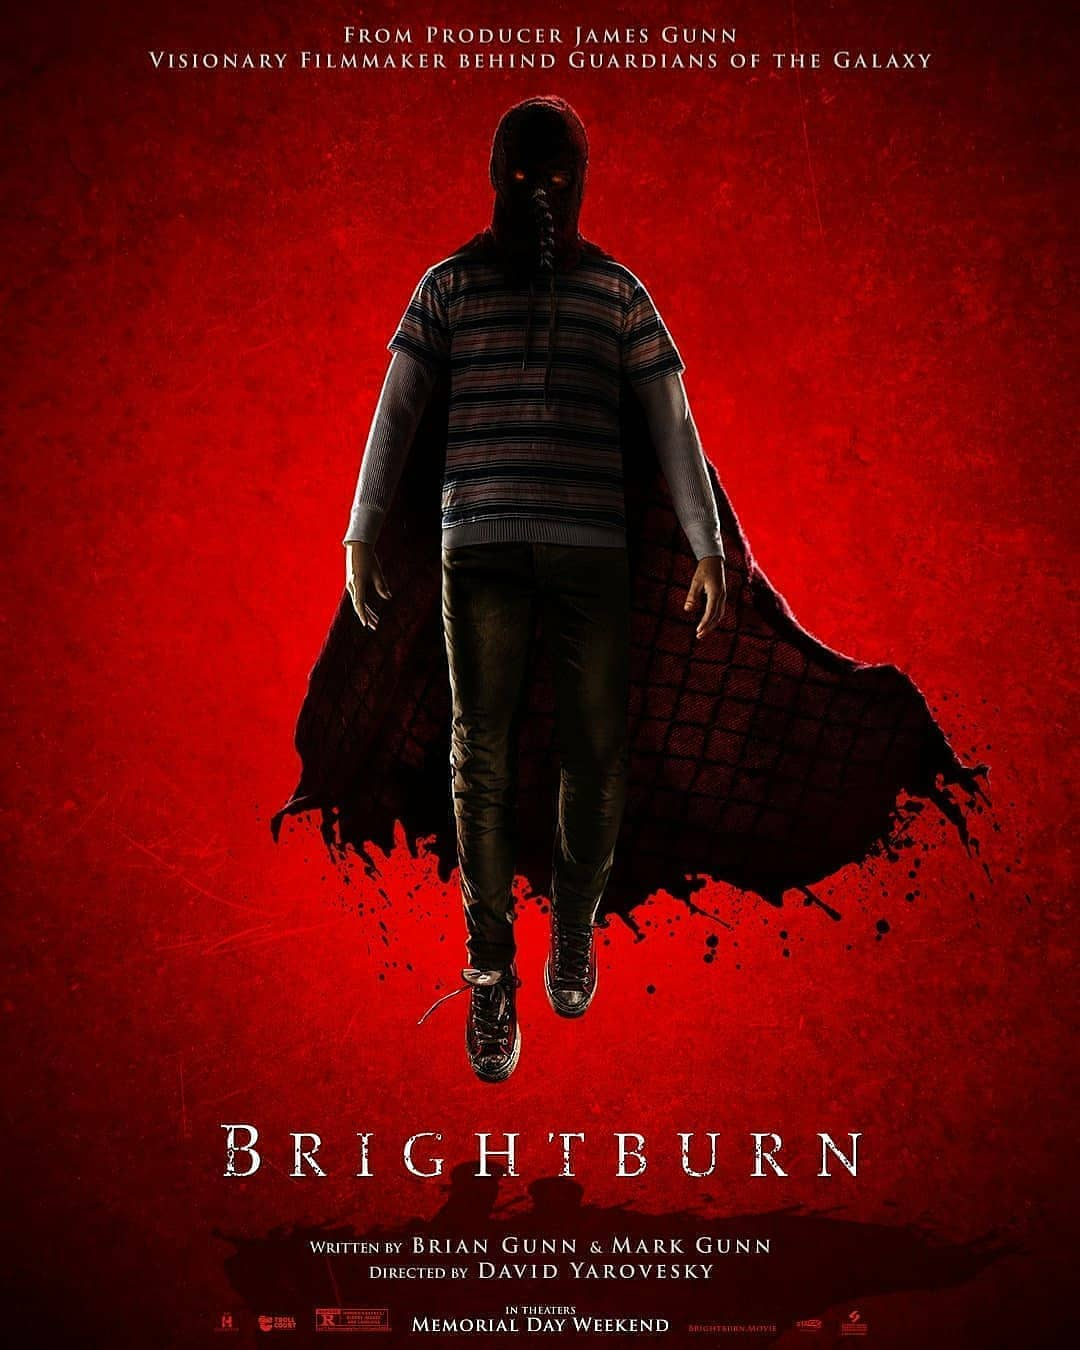 brightburn movie poster 2019